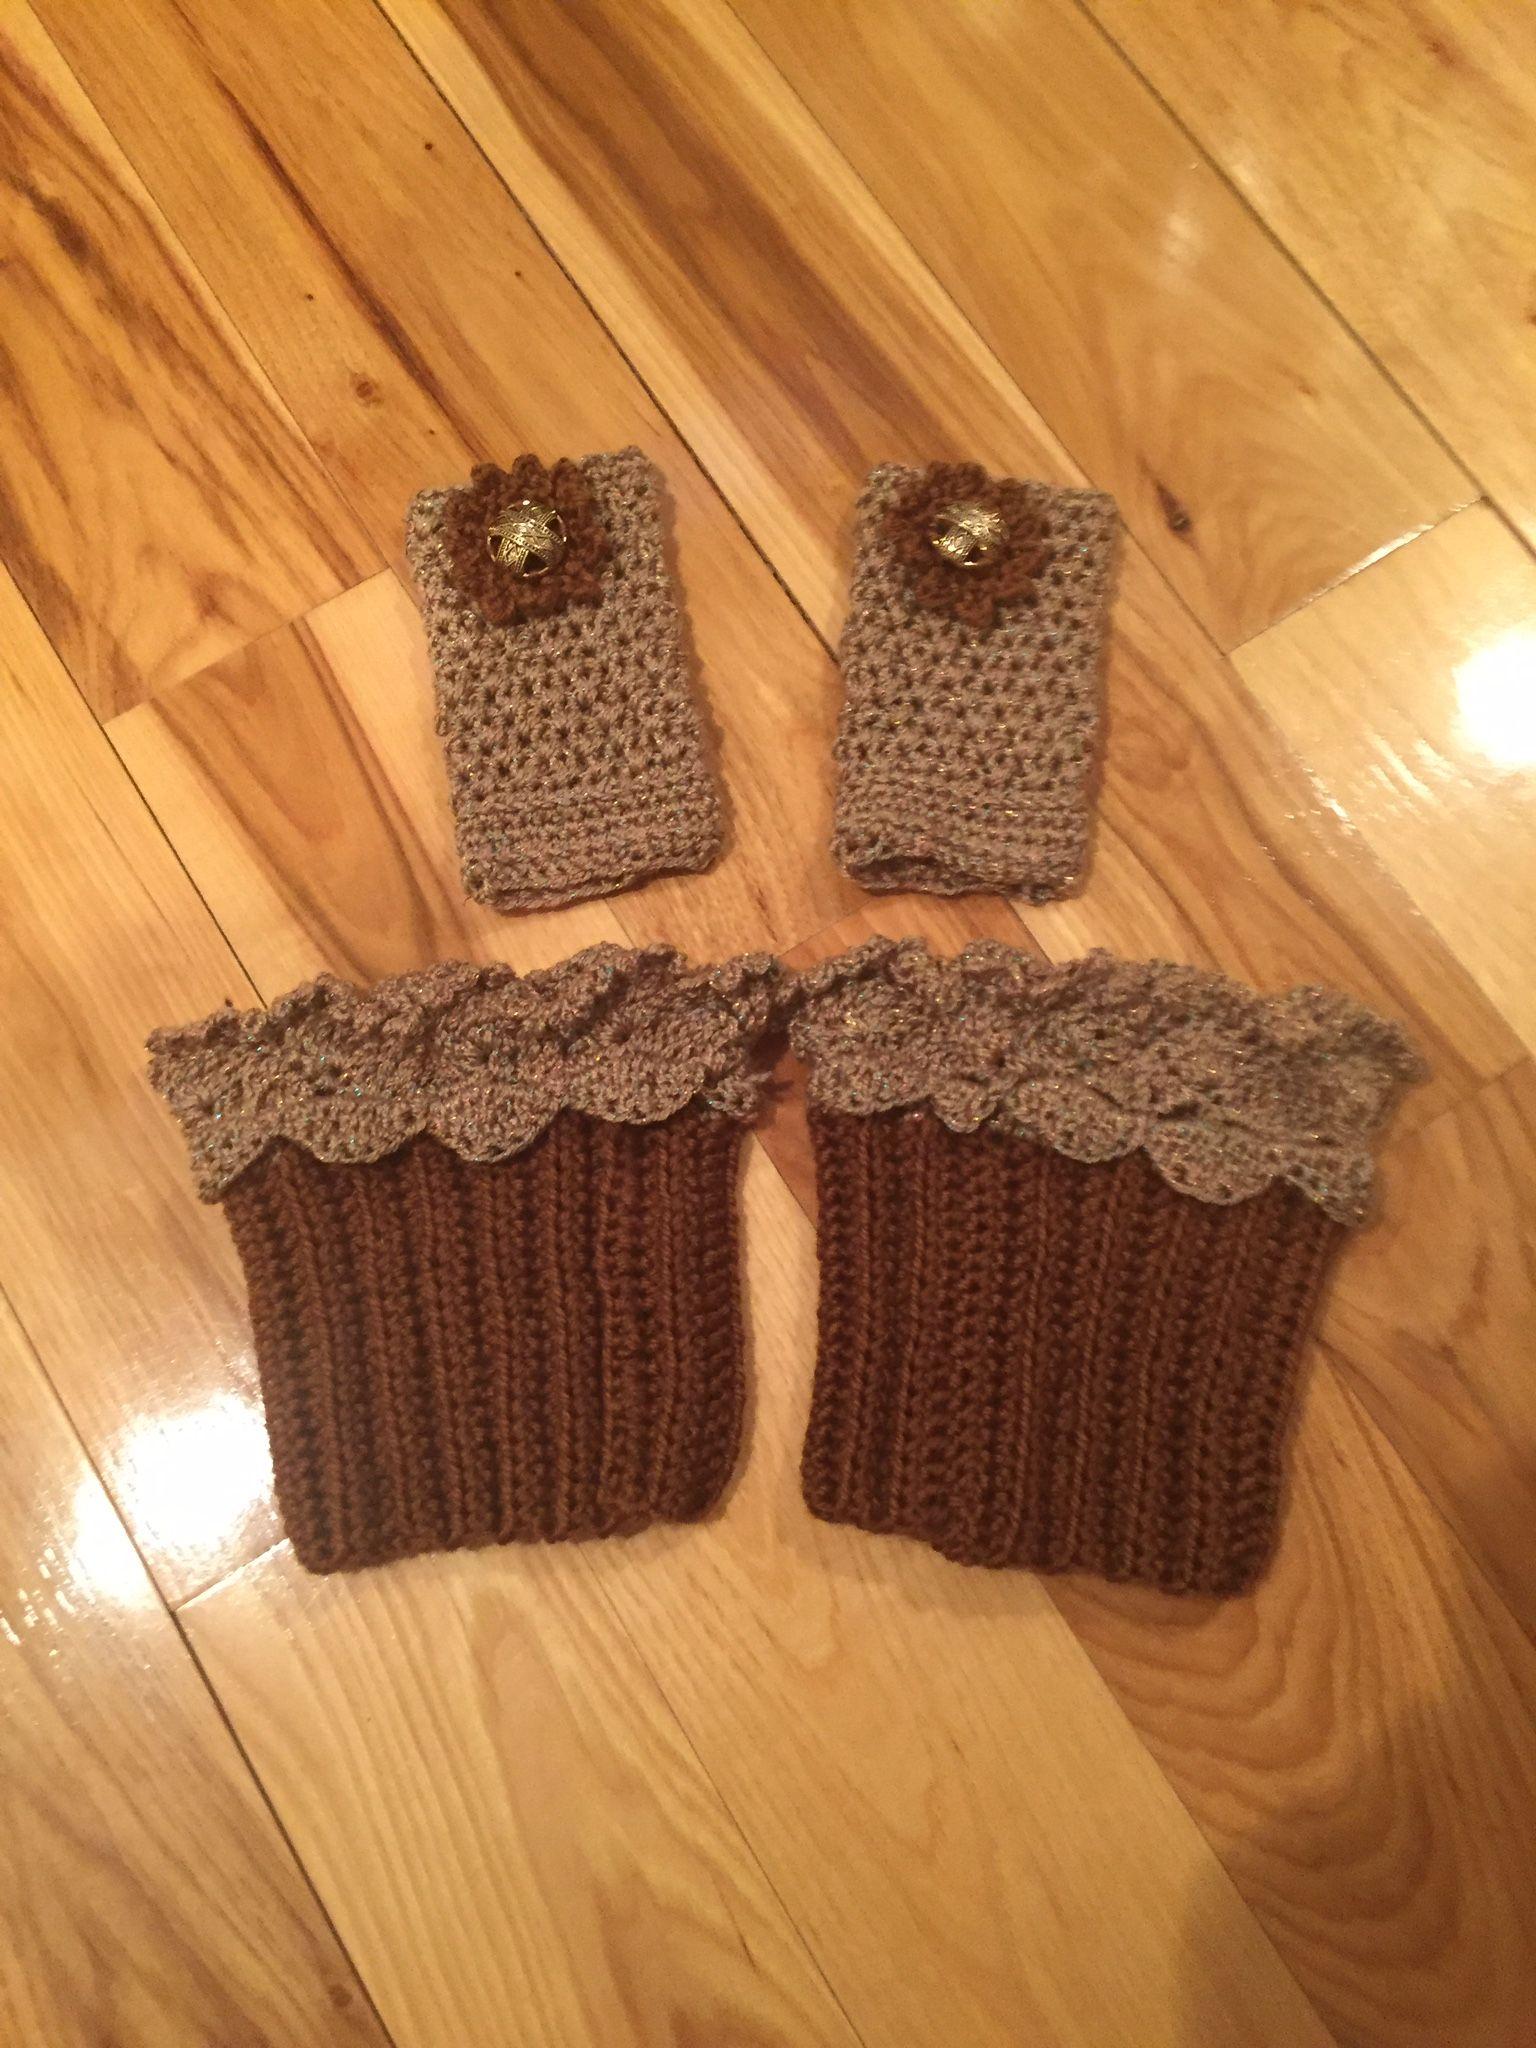 Fingerless gloves and boot cuffs